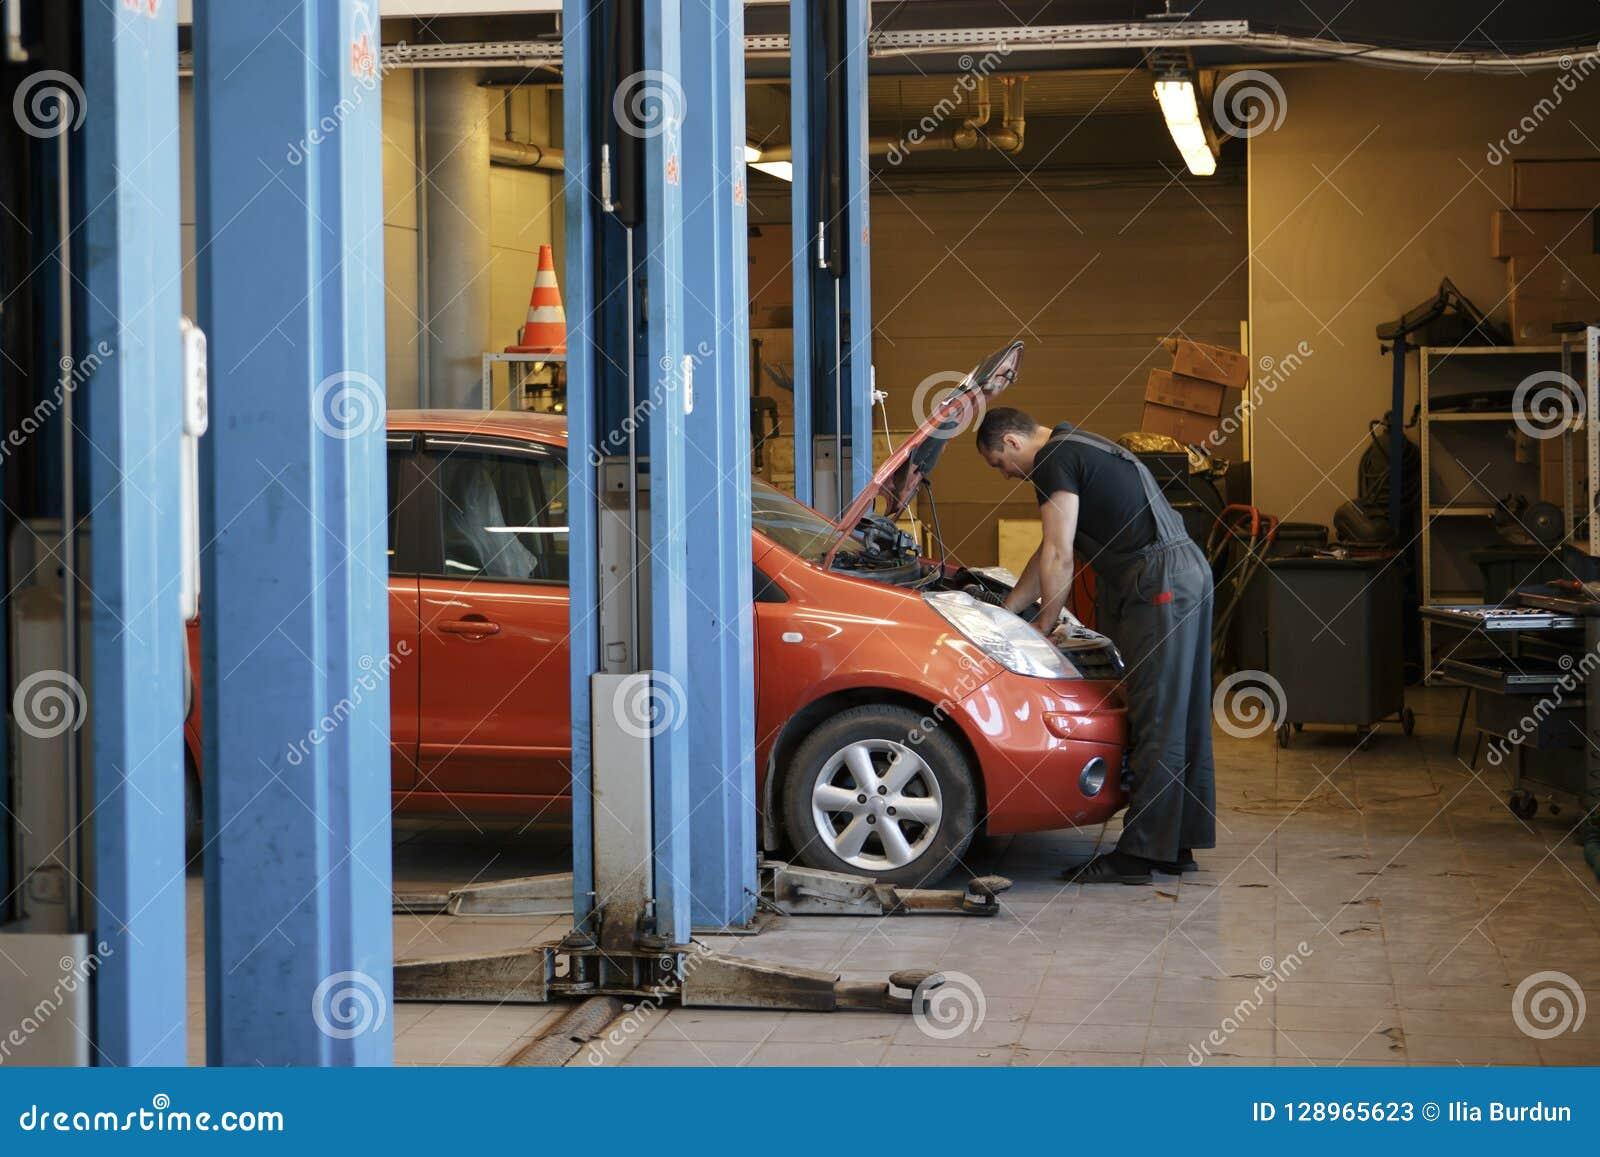 Spezialistenautomechaniker Im Autoservice, Kontrollen Das